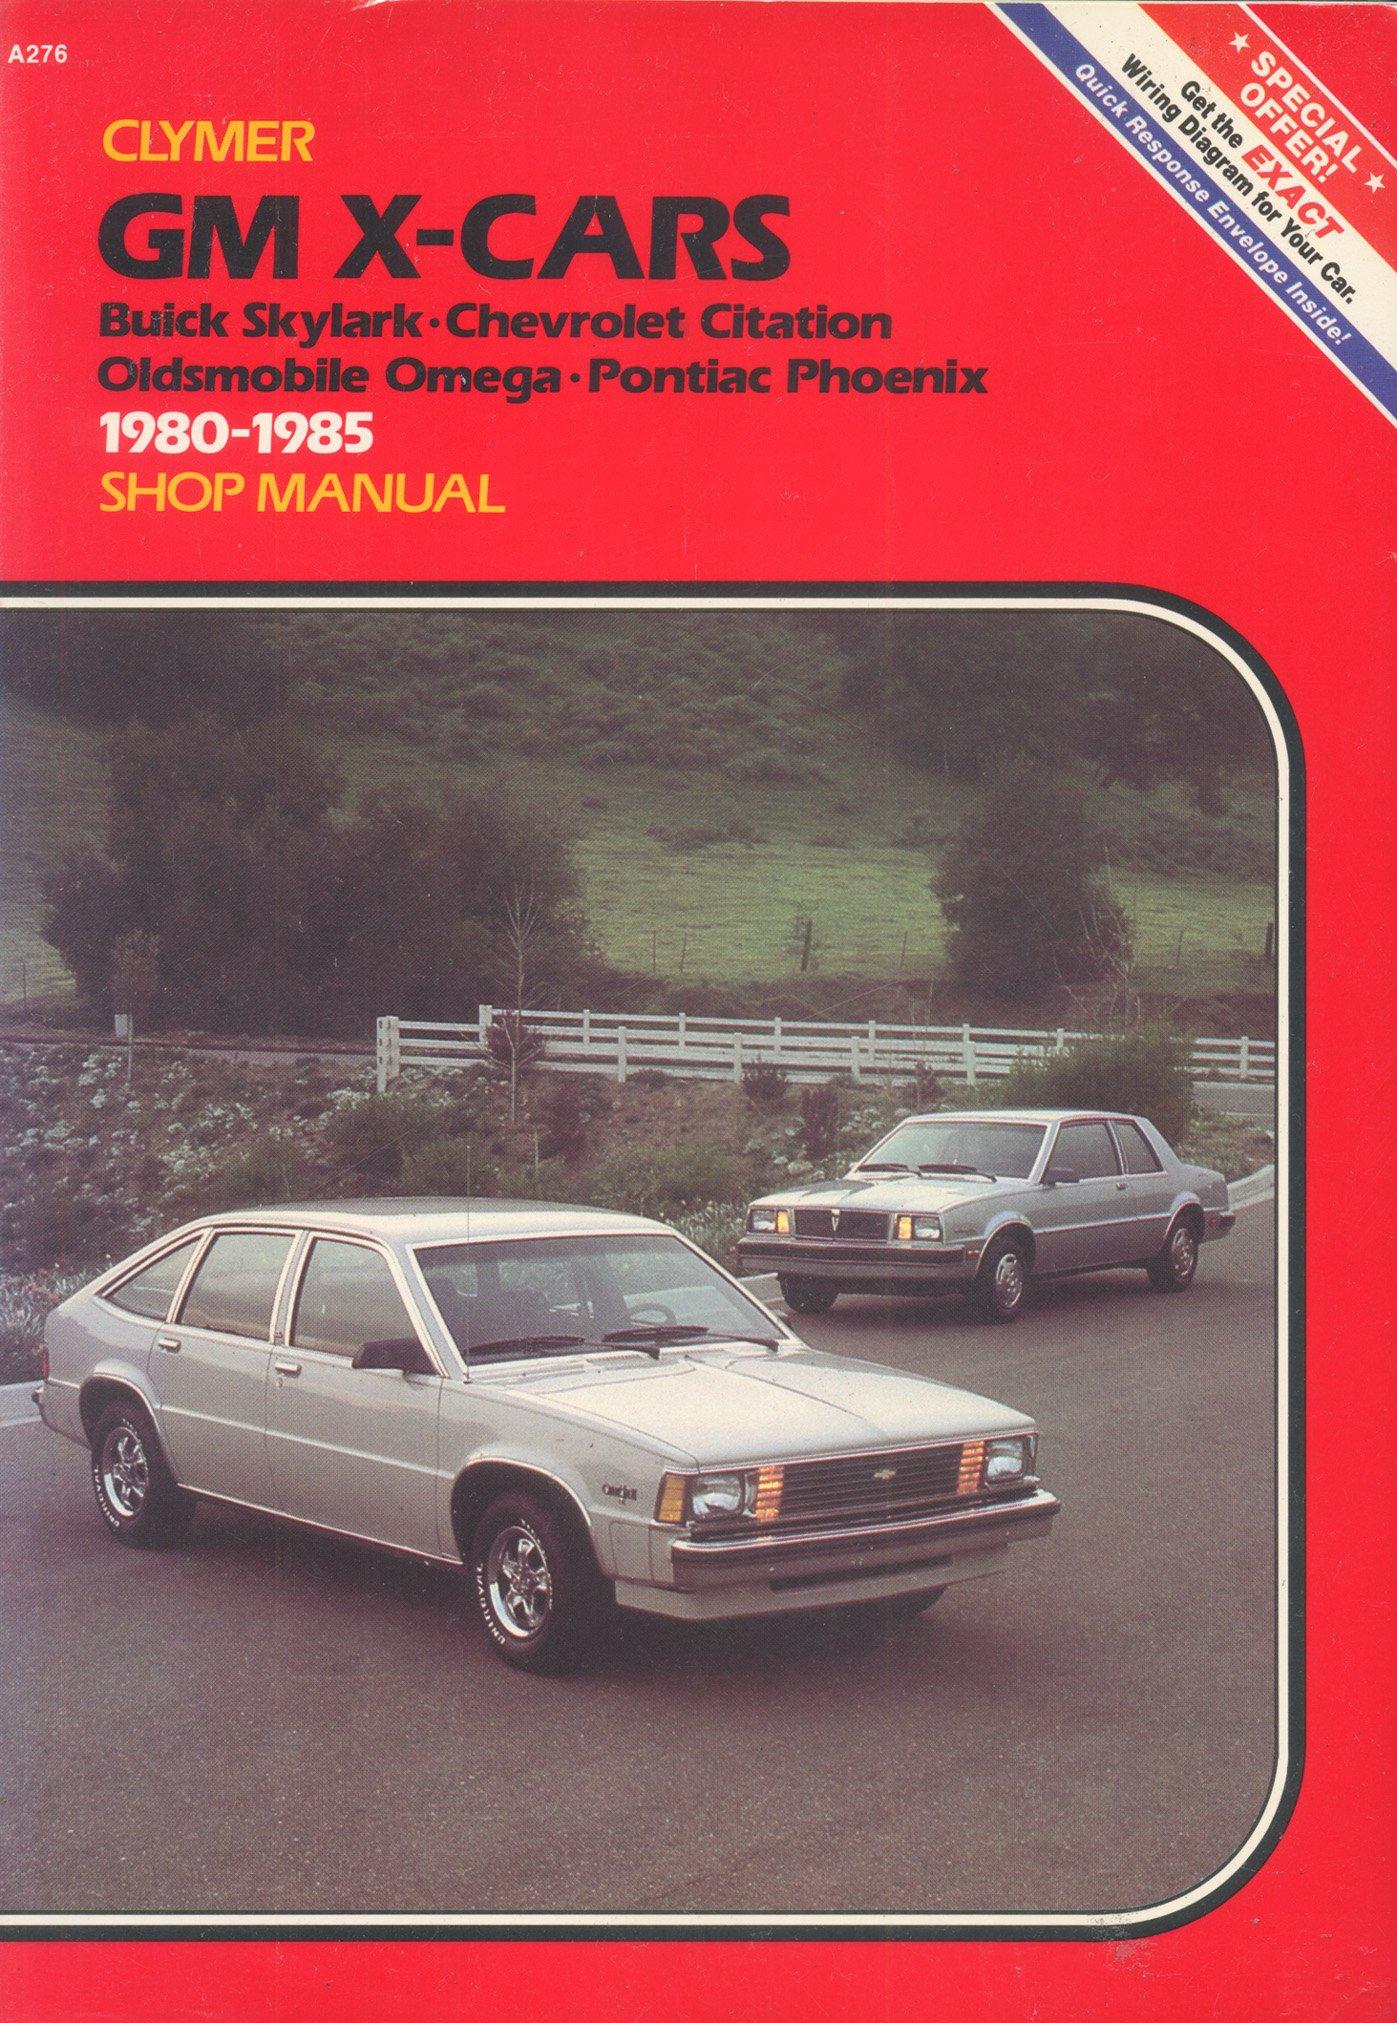 GM X-Cars Buick Skylark-Chevrolet Citation-Oldsmobile Omega-Pontiac  Phoenix: 1980-1985 Shop Manual: Ron Wright: 9780892873906: Amazon.com: Books